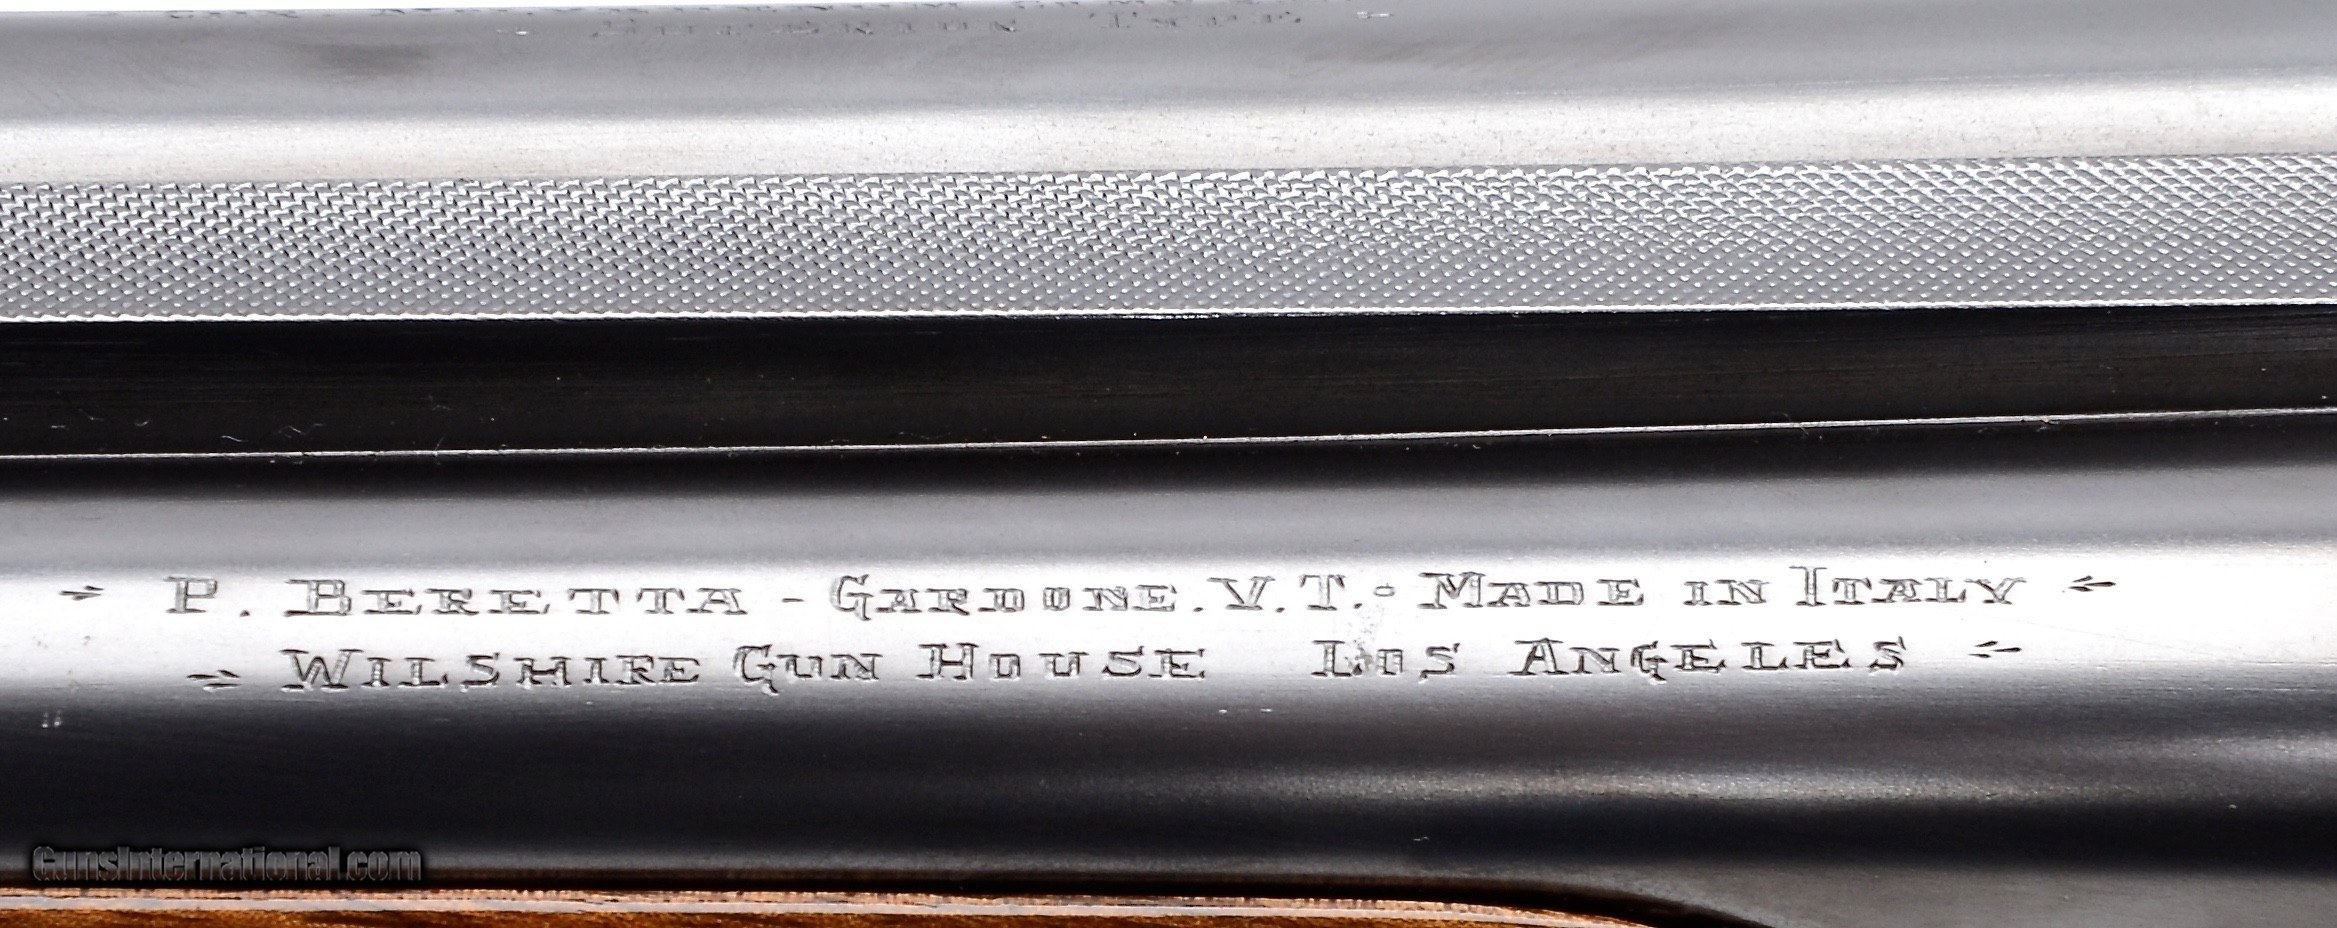 Beretta 450 sidelock 12 gauge Live Pigeon gun for sale